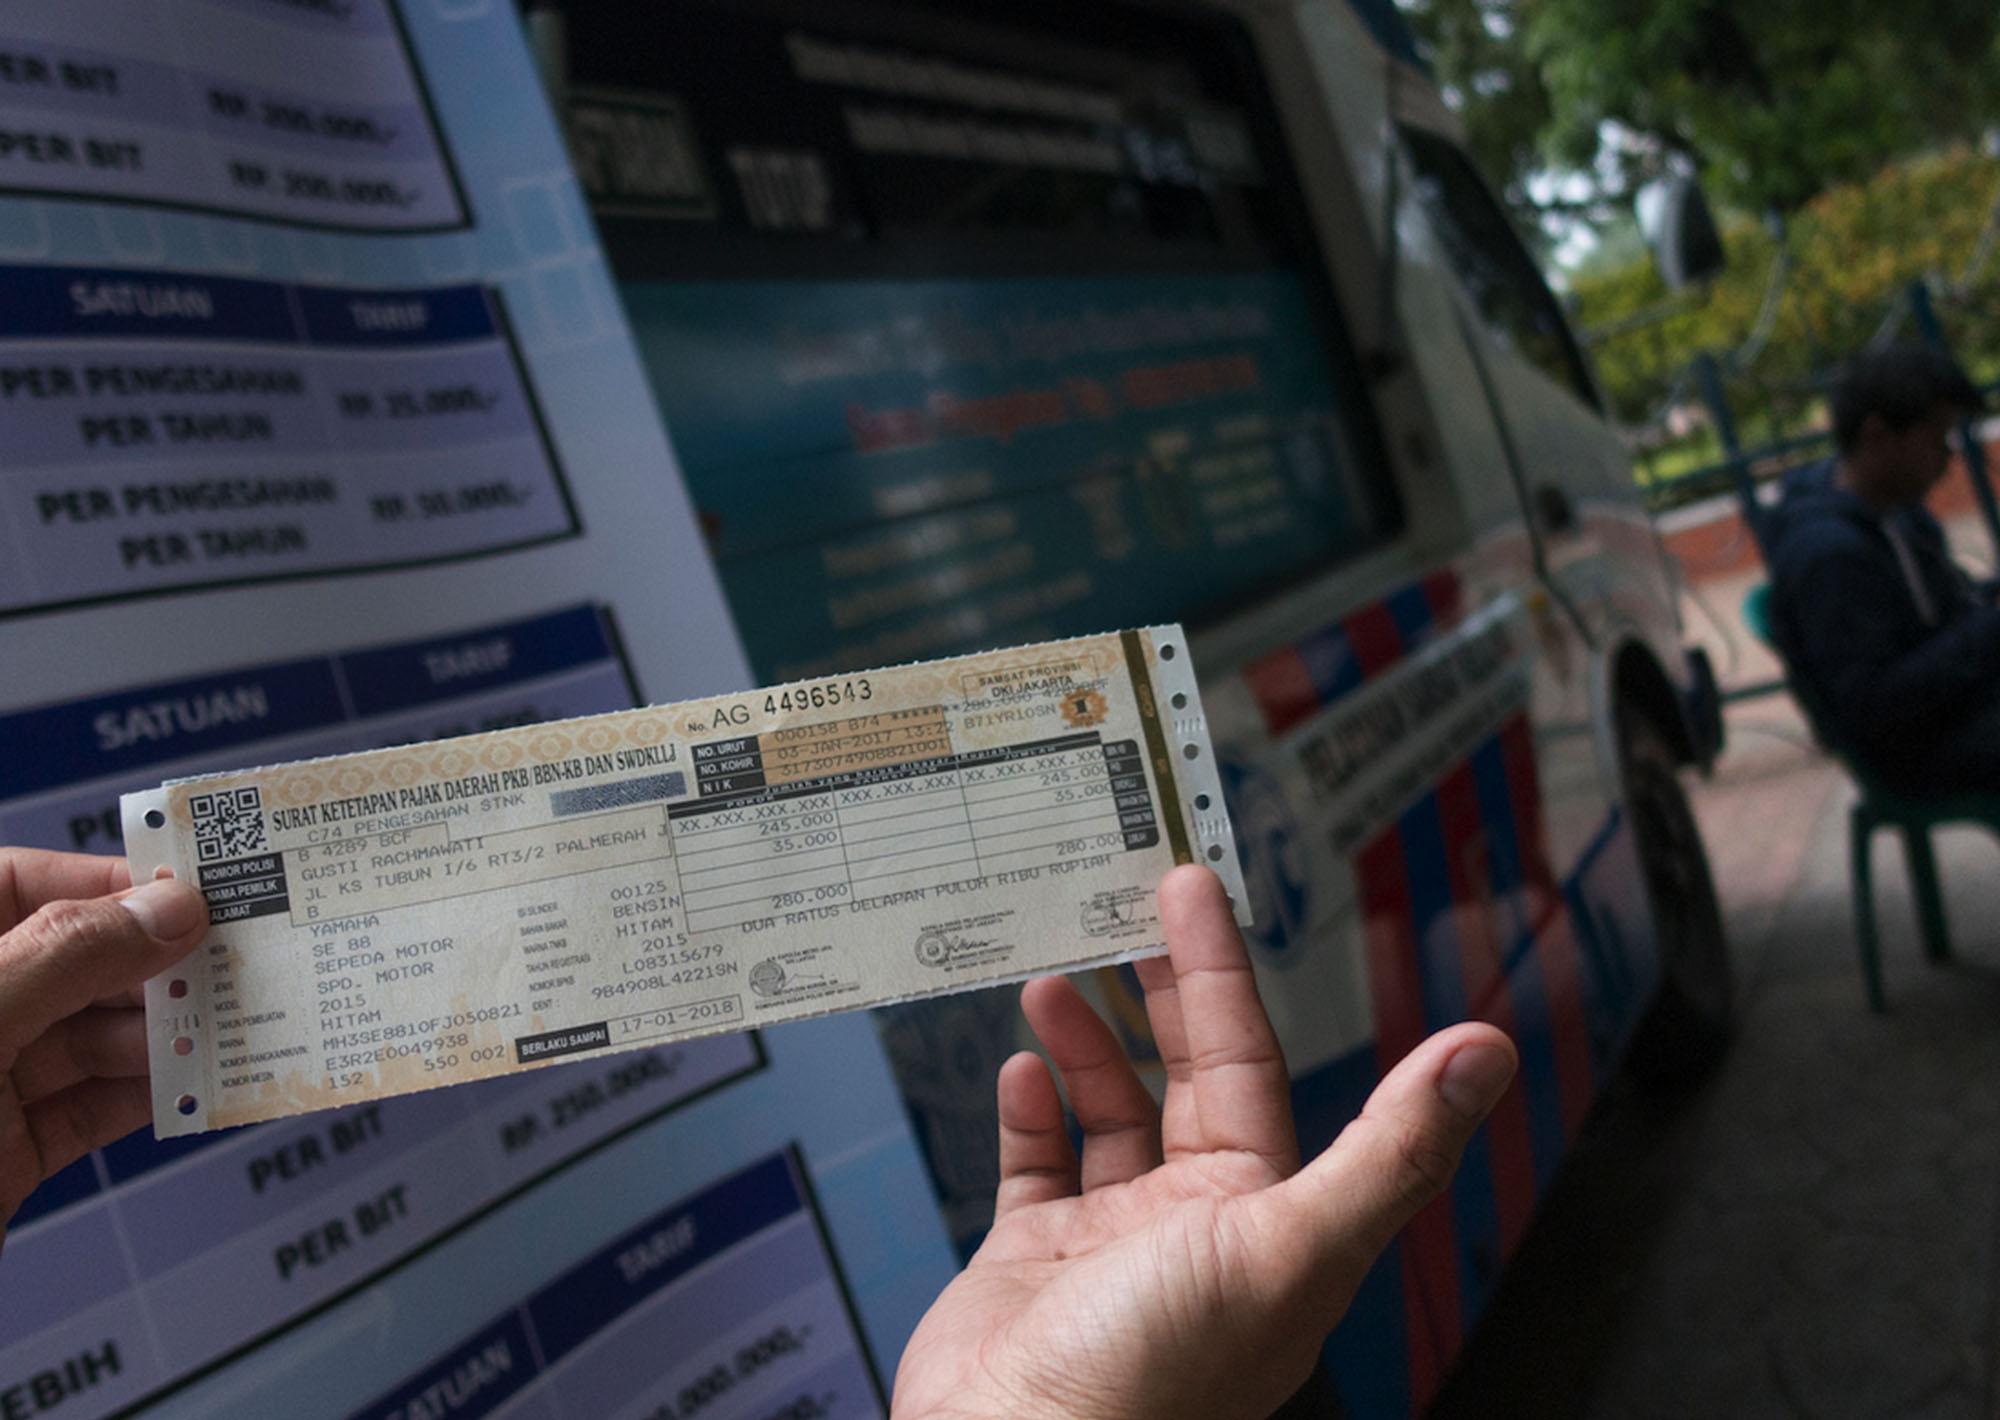 cara cek pajak kendaraan bermotor di samsat online moneysmart id rh moneysmart id cara cek pajak online jatim cara cek pajak online jateng